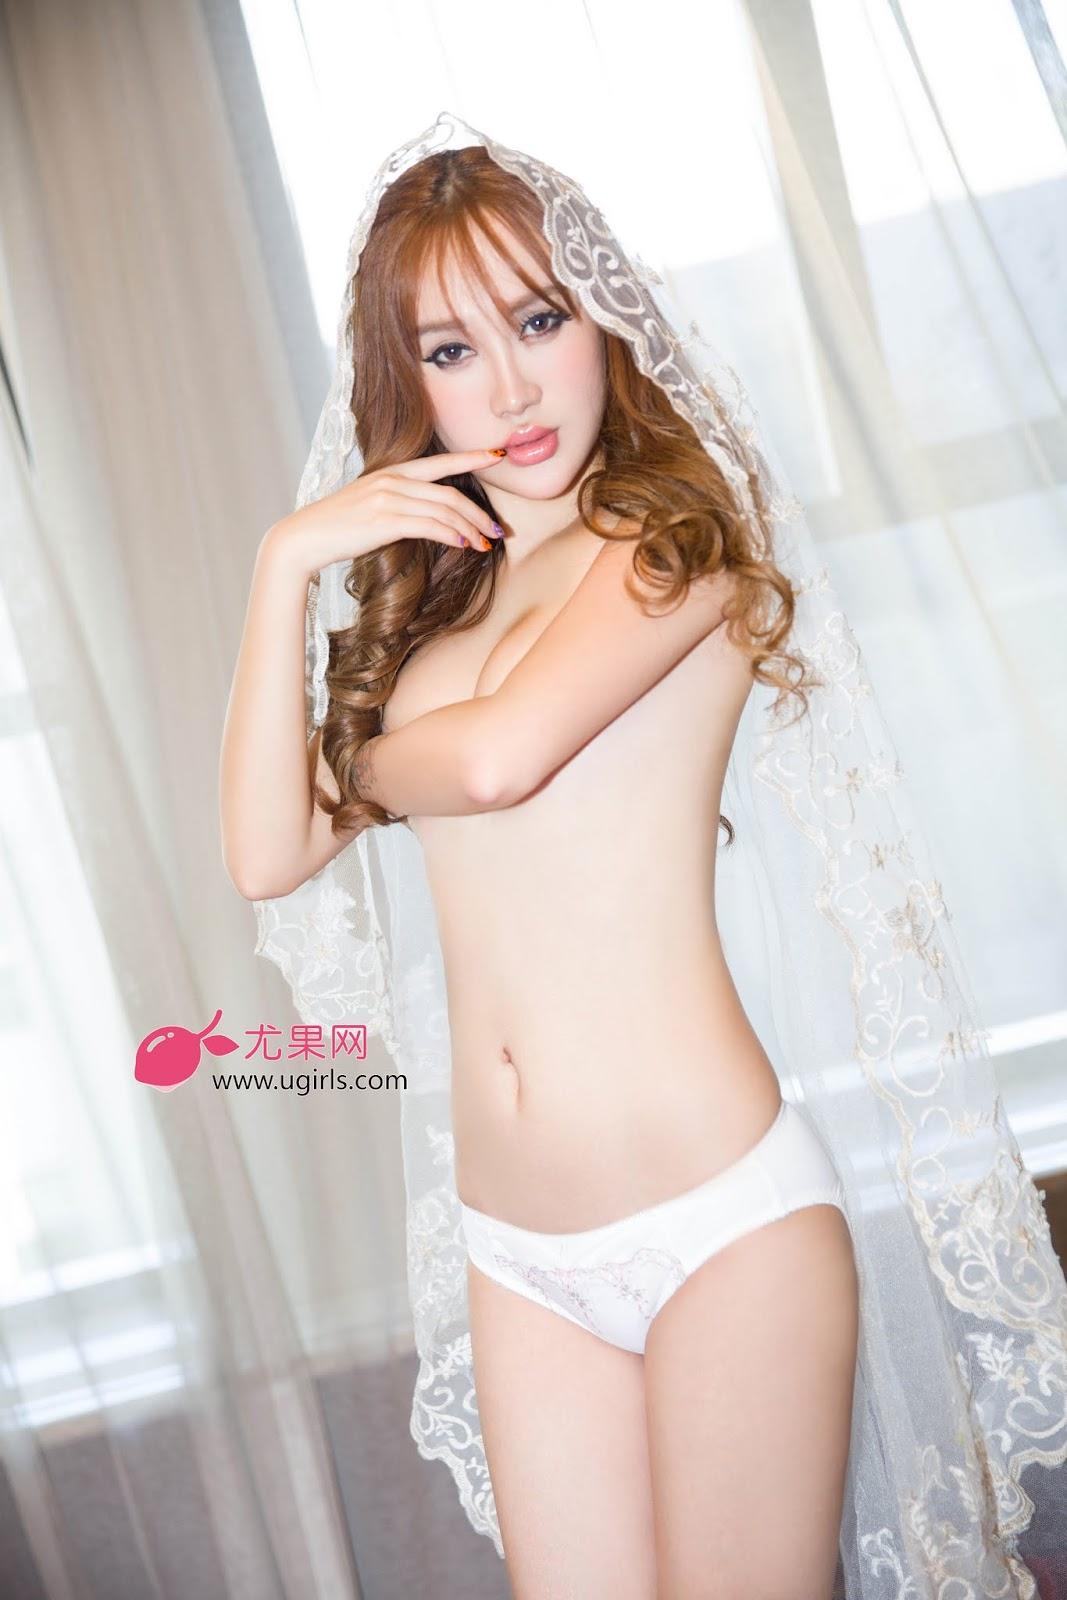 A14A4334 - Hot Photo UGIRLS NO.3 Nude Girl